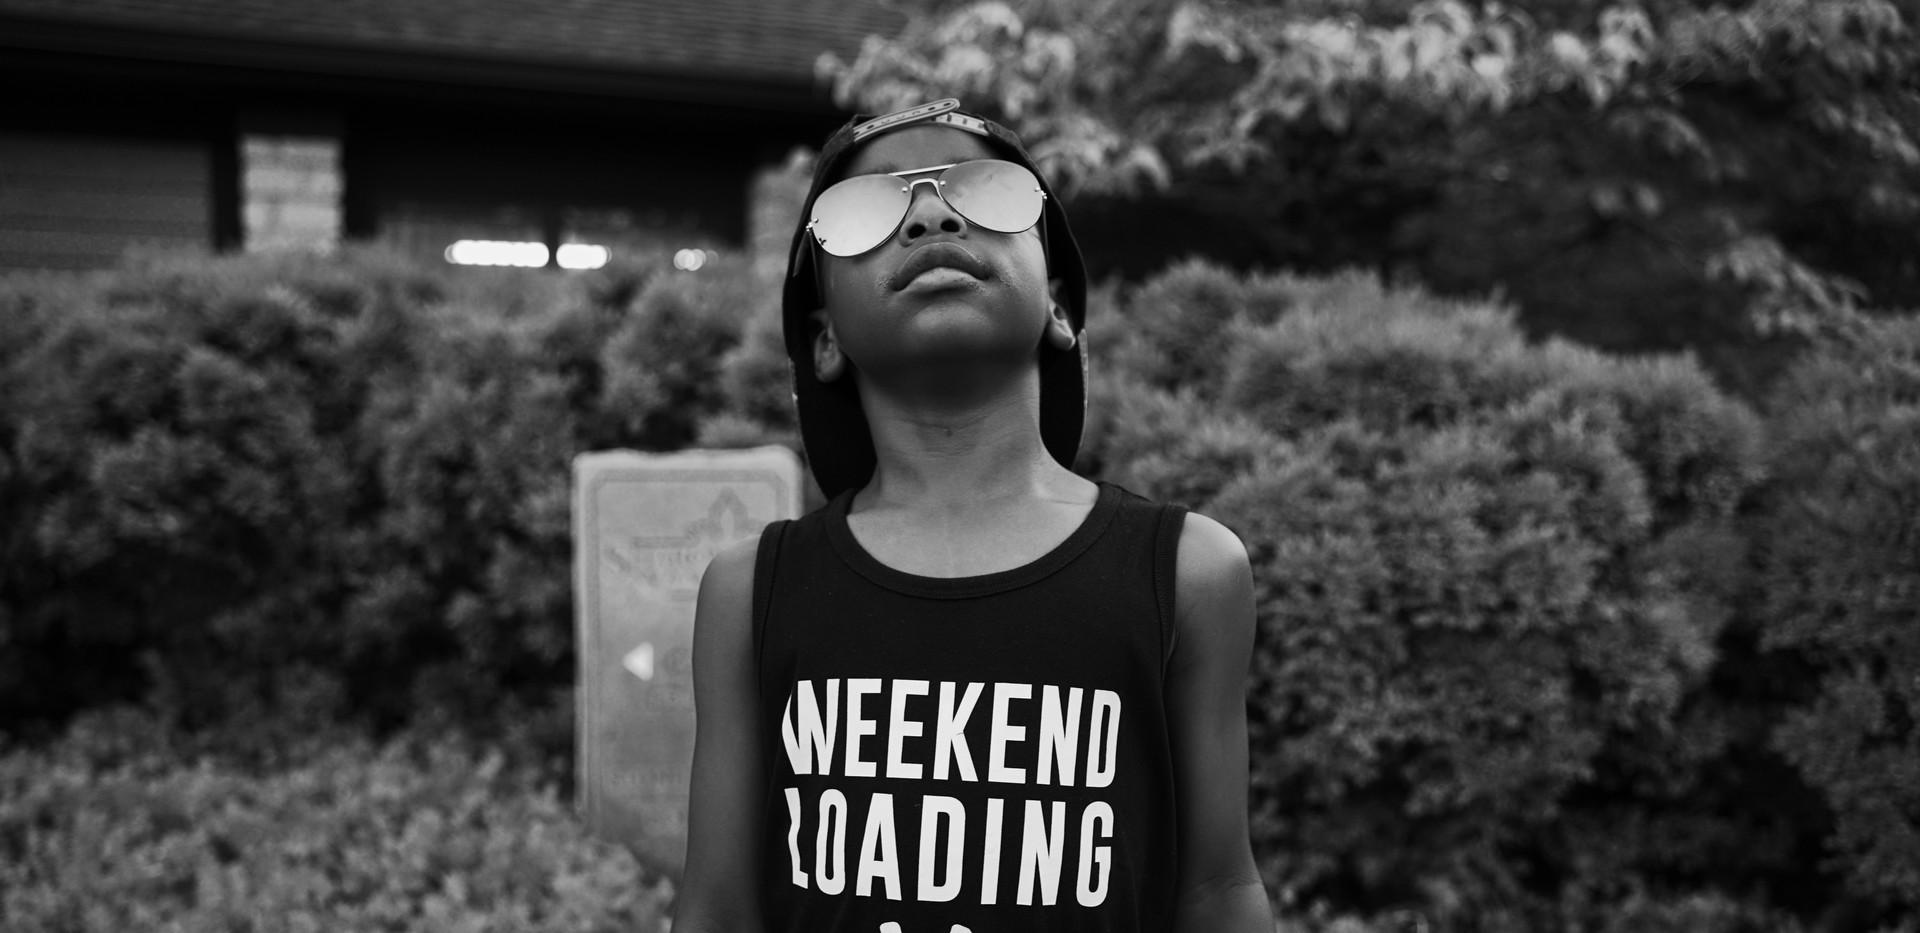 ...weekend loading